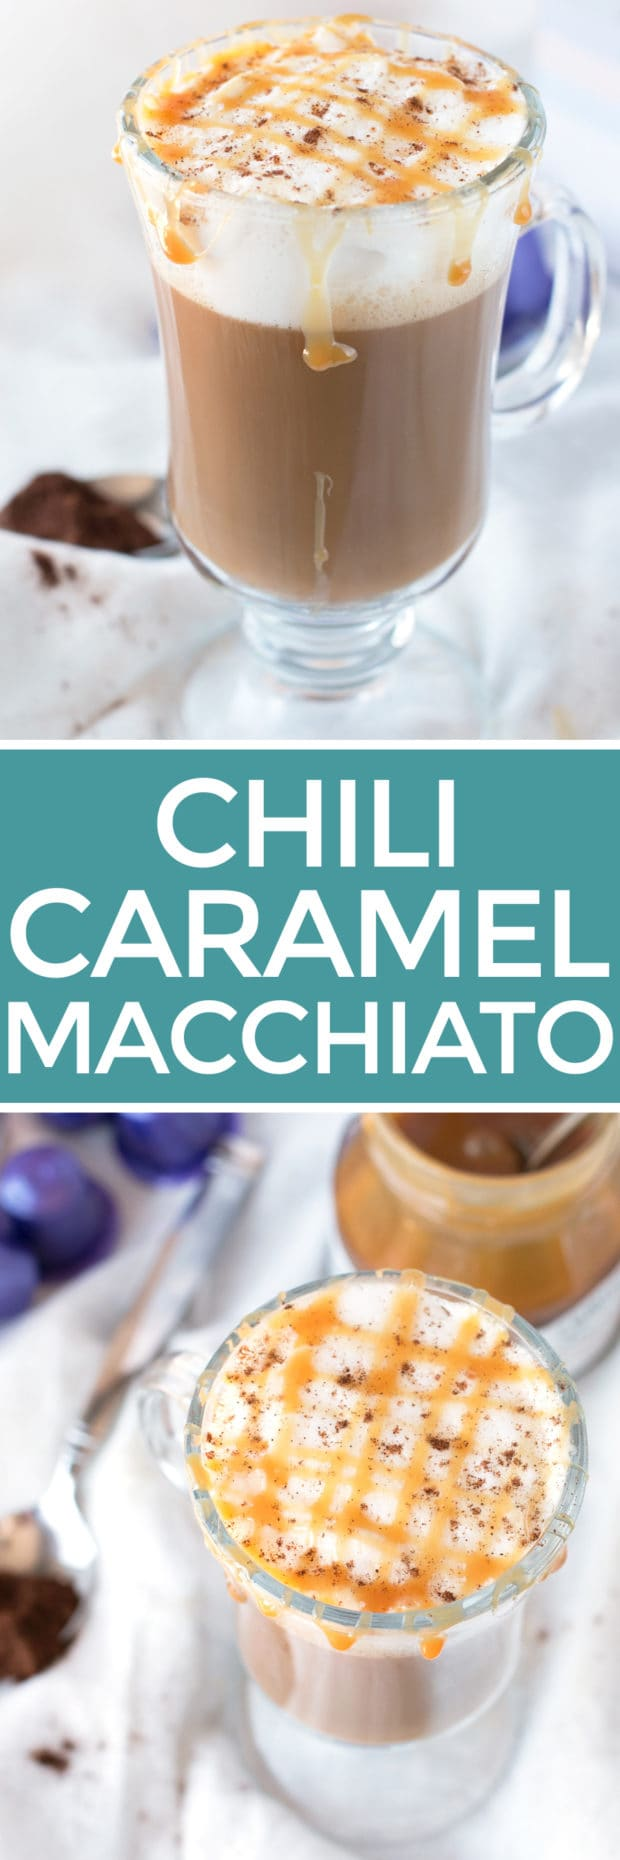 Chili Caramel Macchiato | cakenknife.com #coffee #espresso